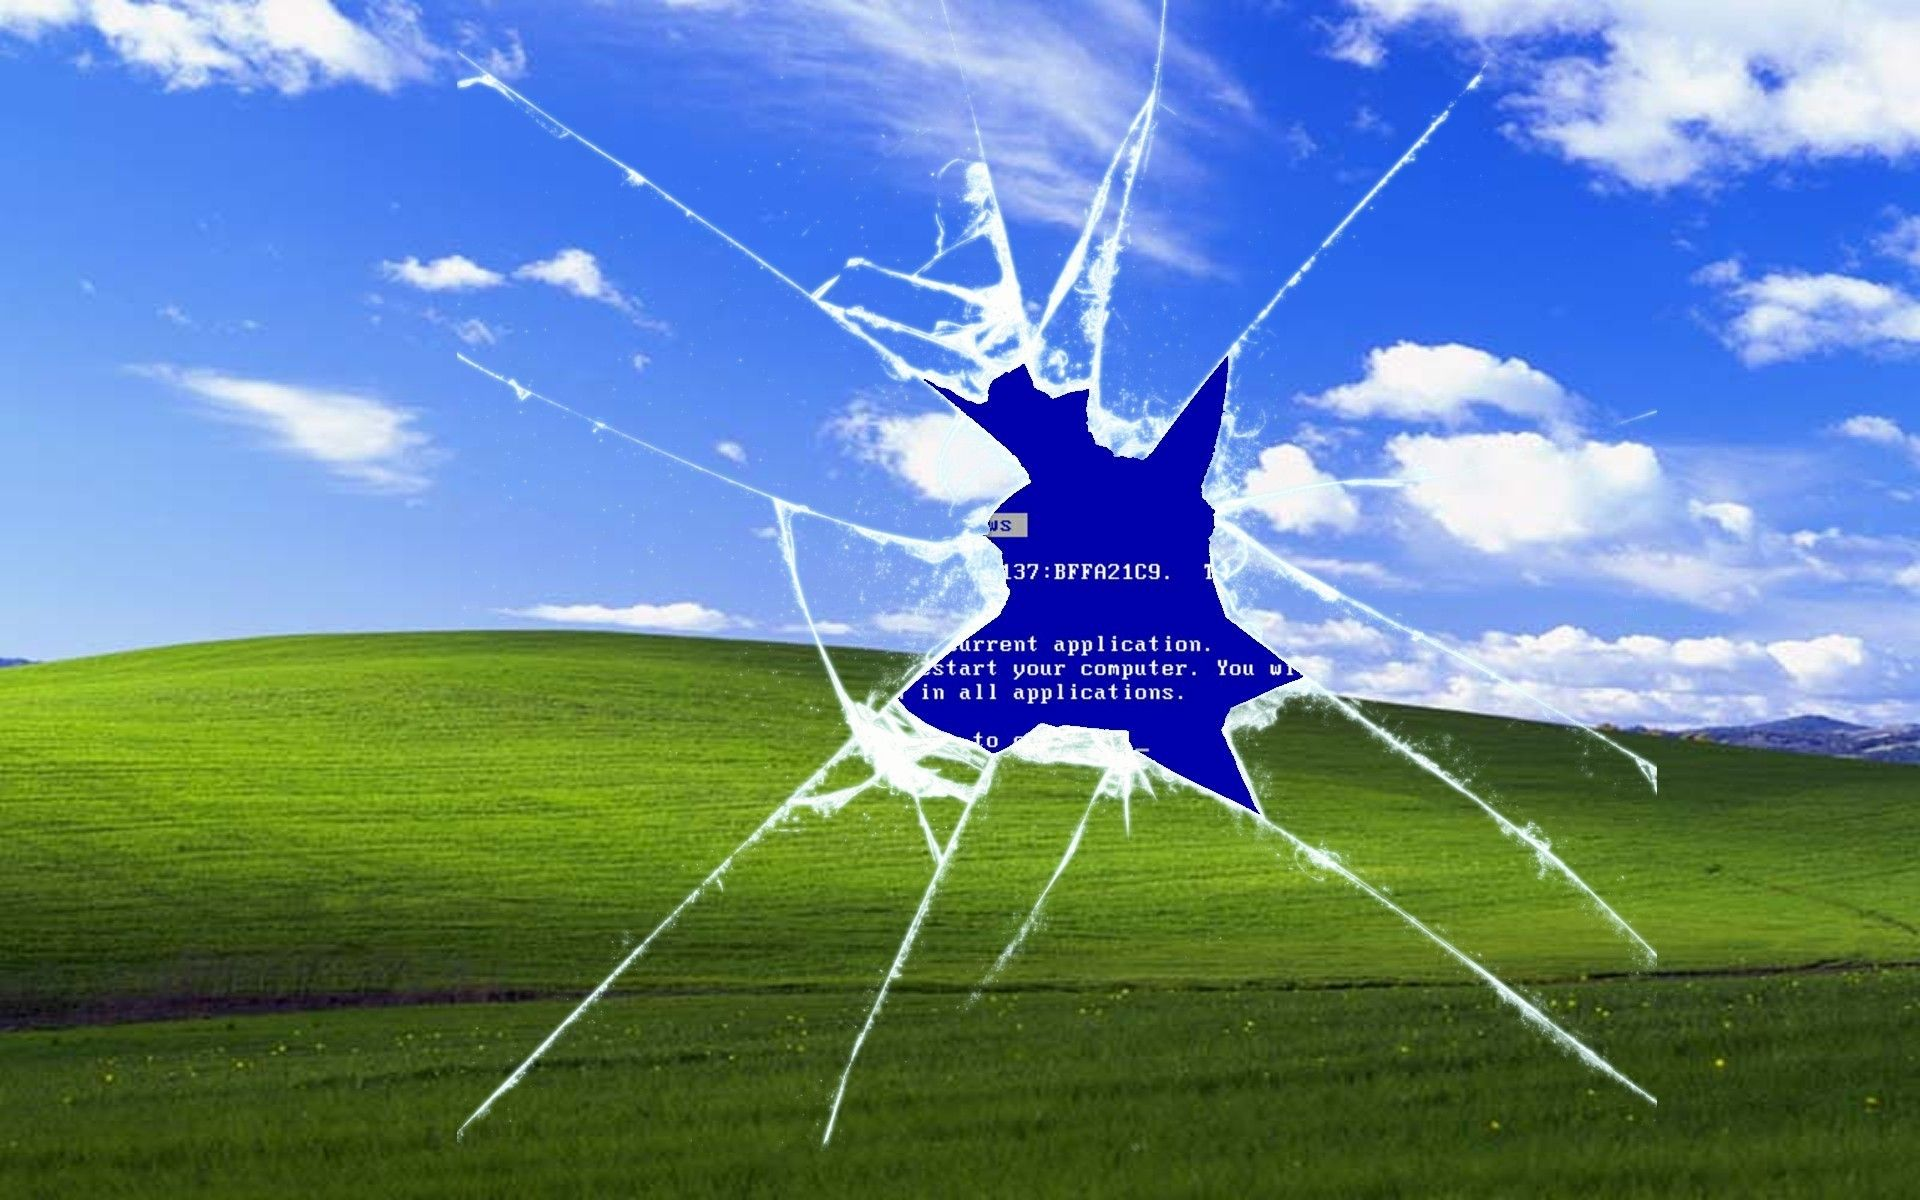 Windows Wallpapers Location Windows Wallpaper Windows Xp Blue Wallpapers